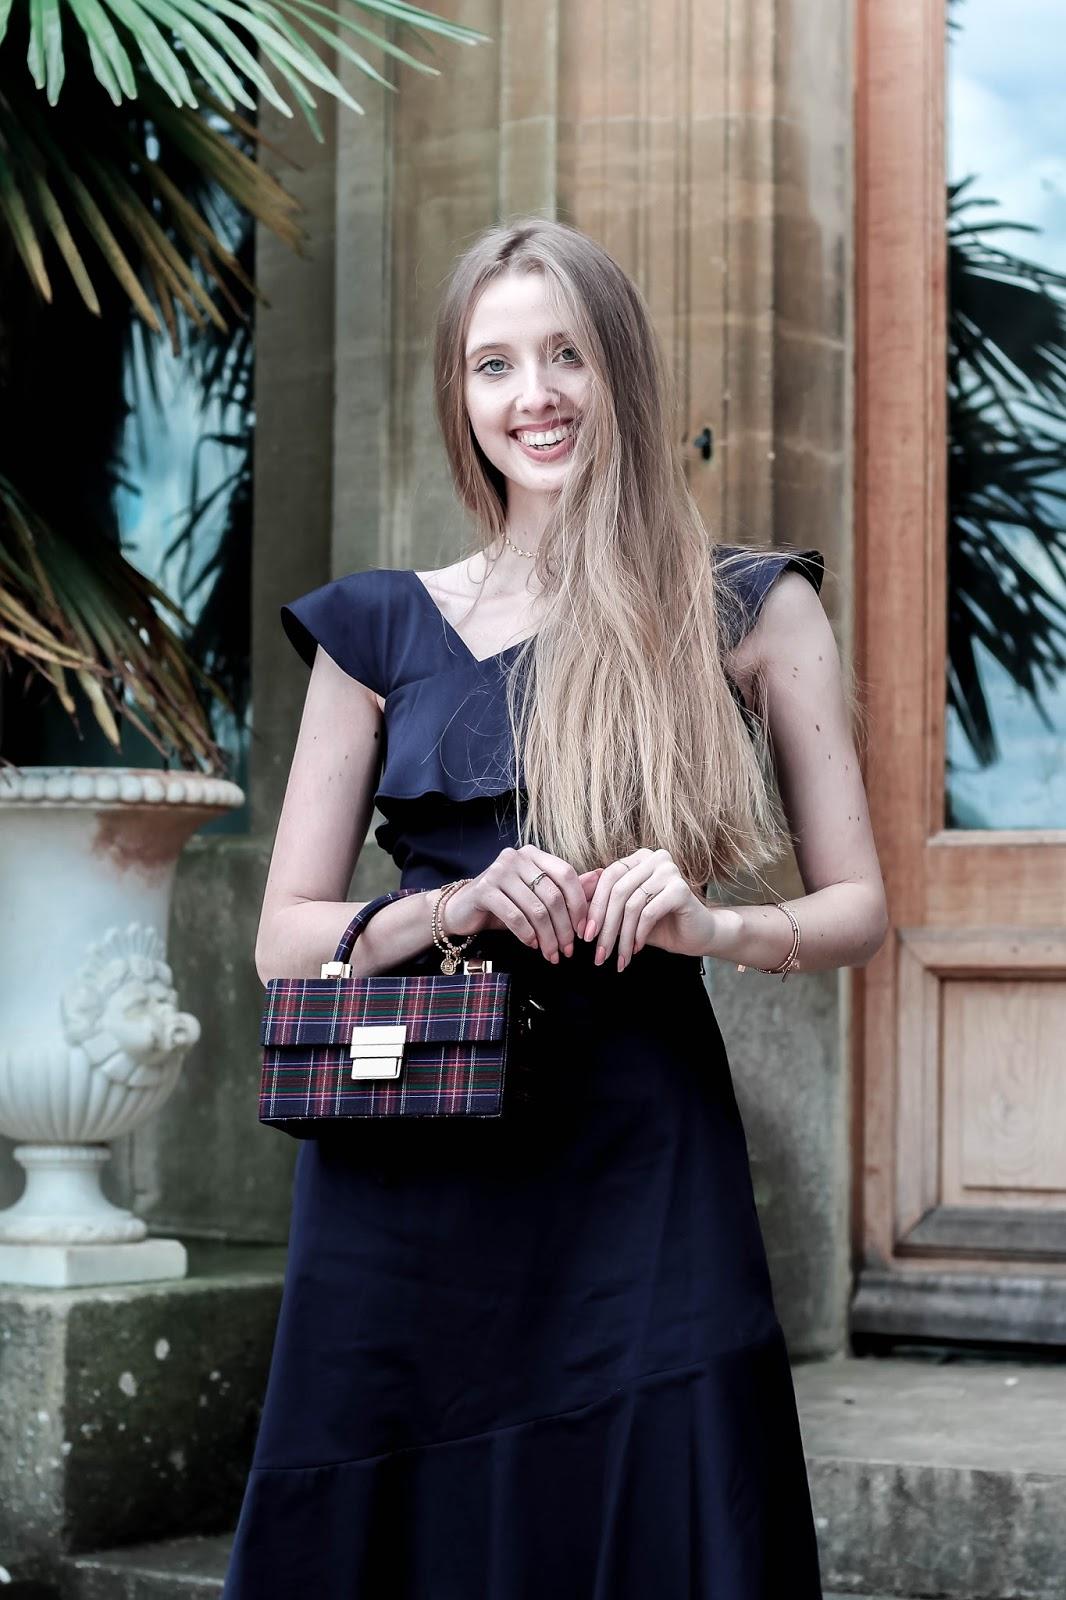 Spring 2018 Minaudière Bag Trend